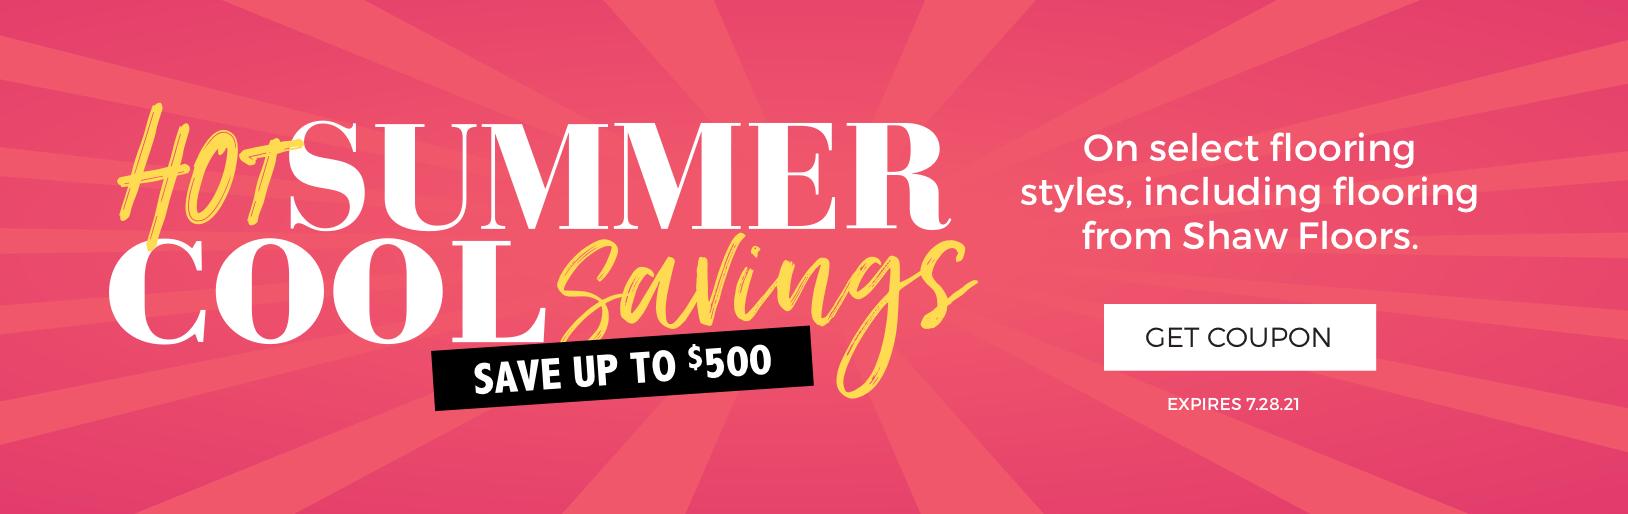 Hot Summer, Cool Savings